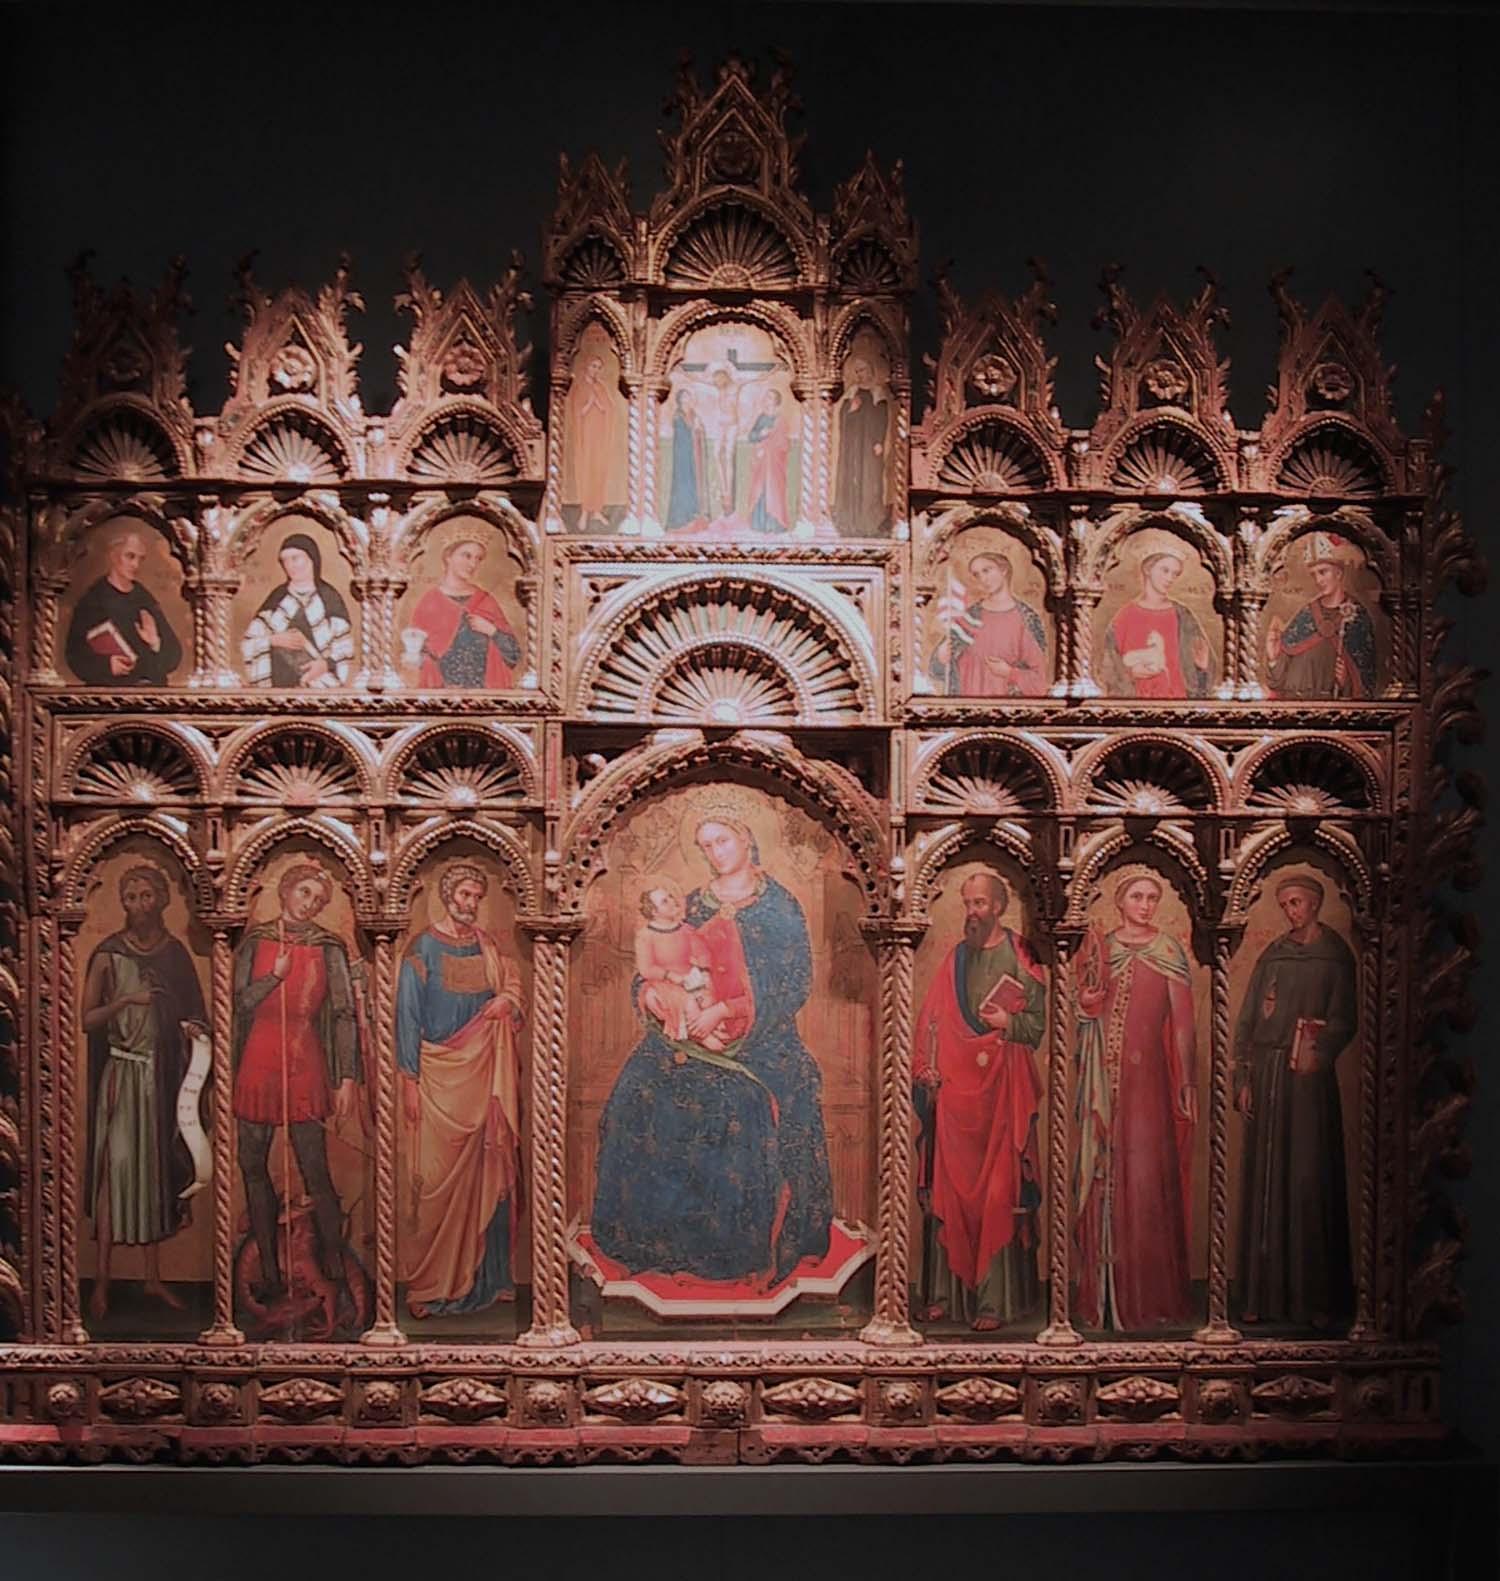 MUSEO-STORICO-ARCHEOLOGICO-DI-SANTARCANGELO (1)